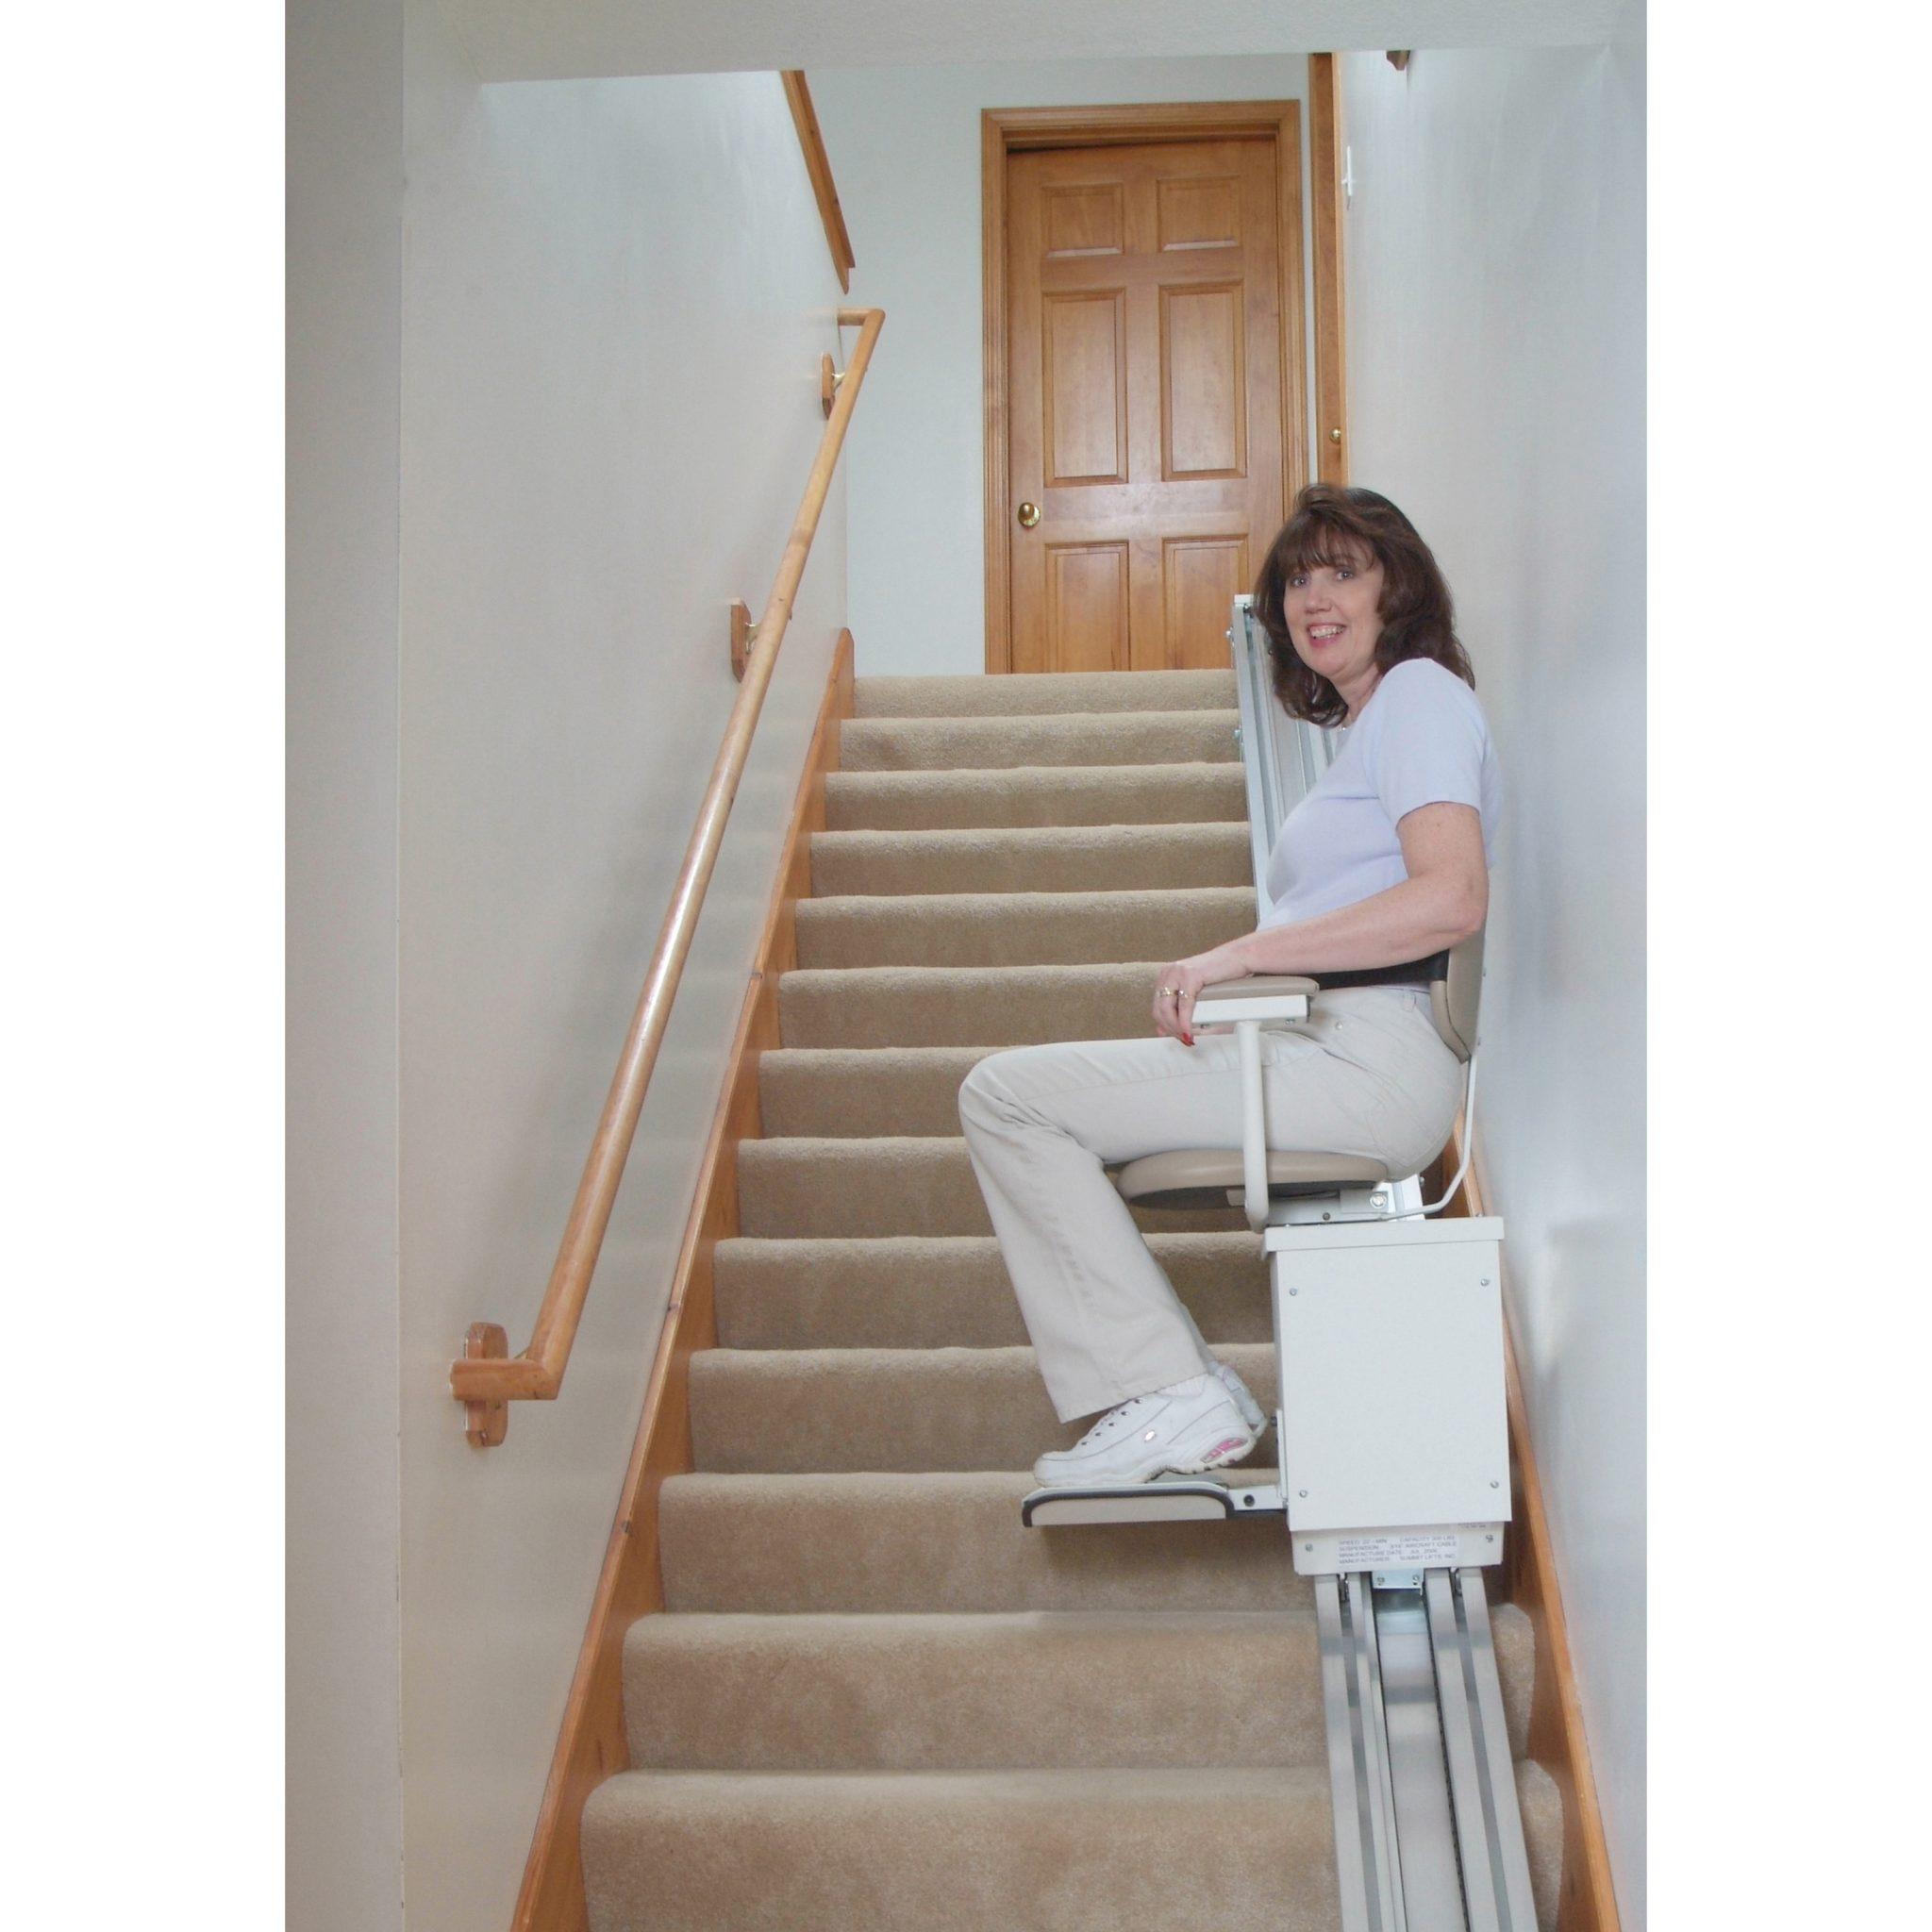 Harmar Summit Stair Lift Sl350ac Homeaccessproducts Com